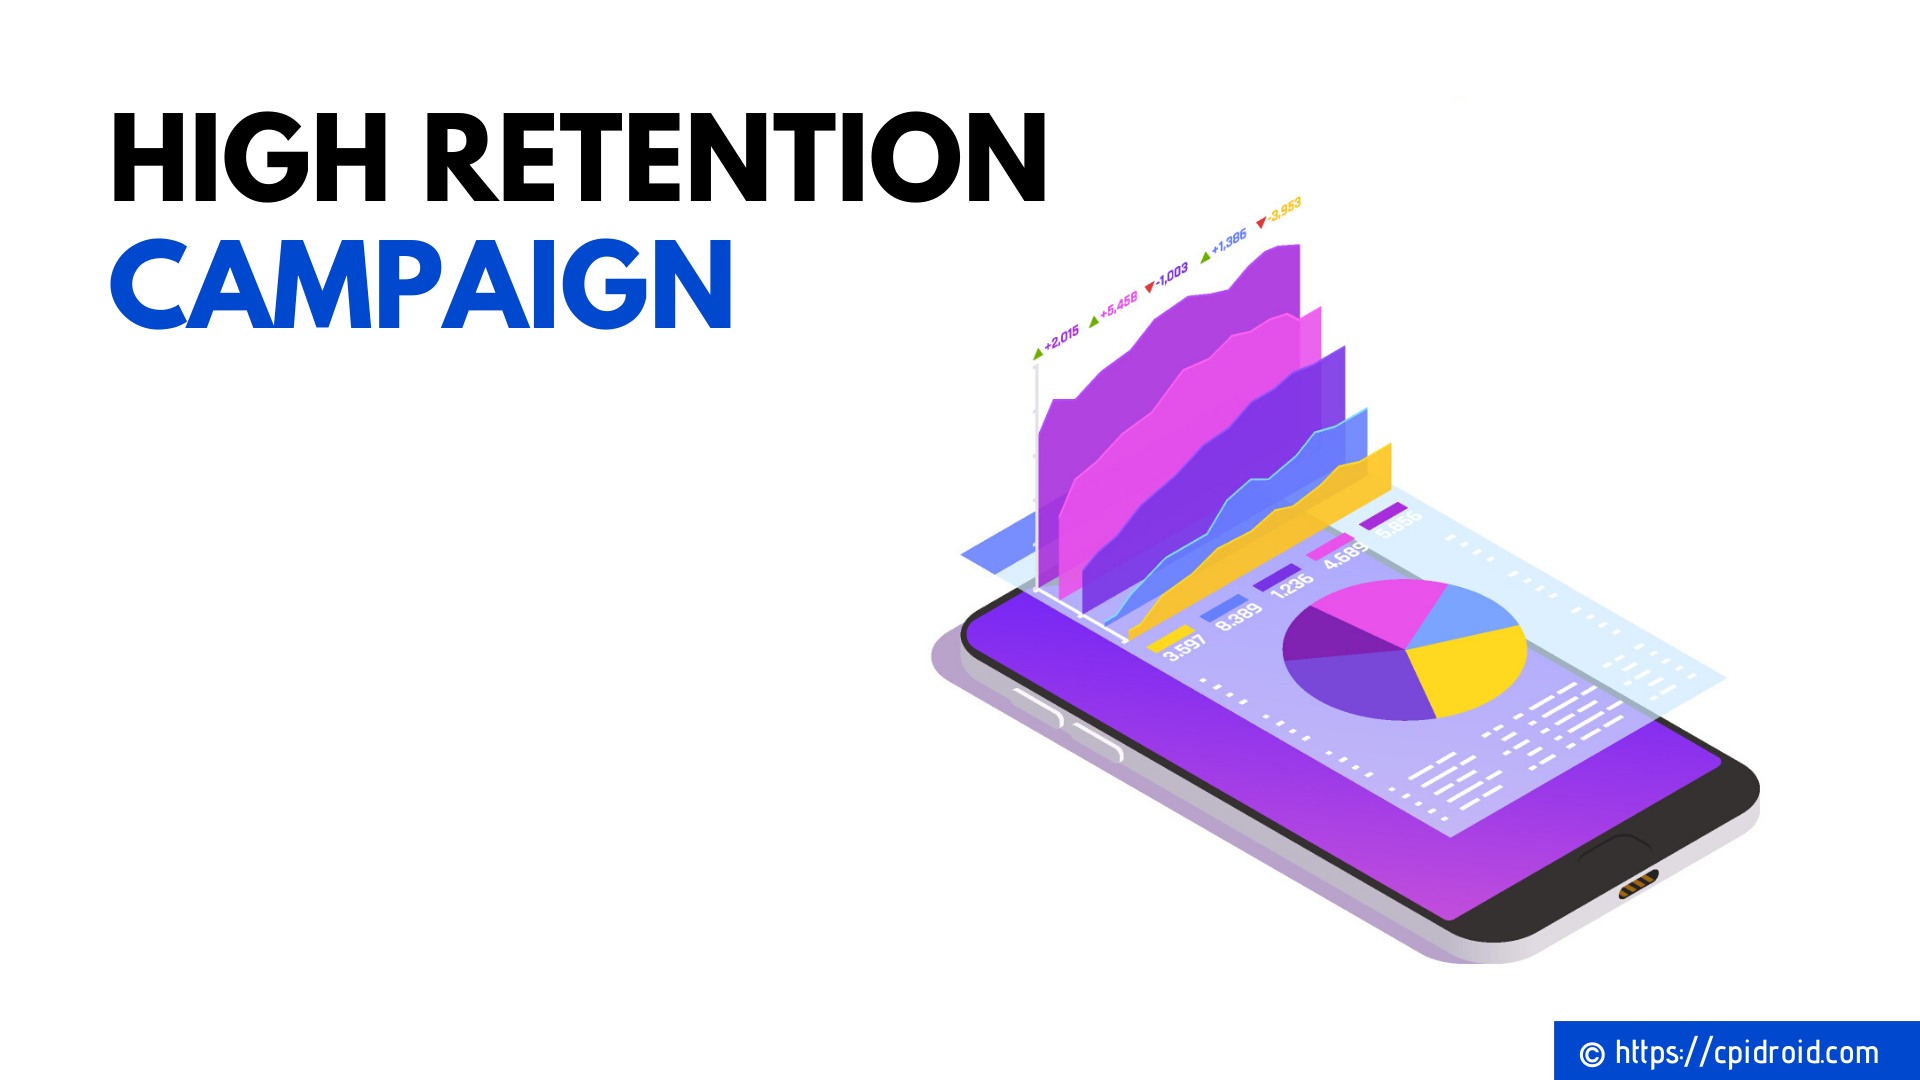 High Retention Campaign